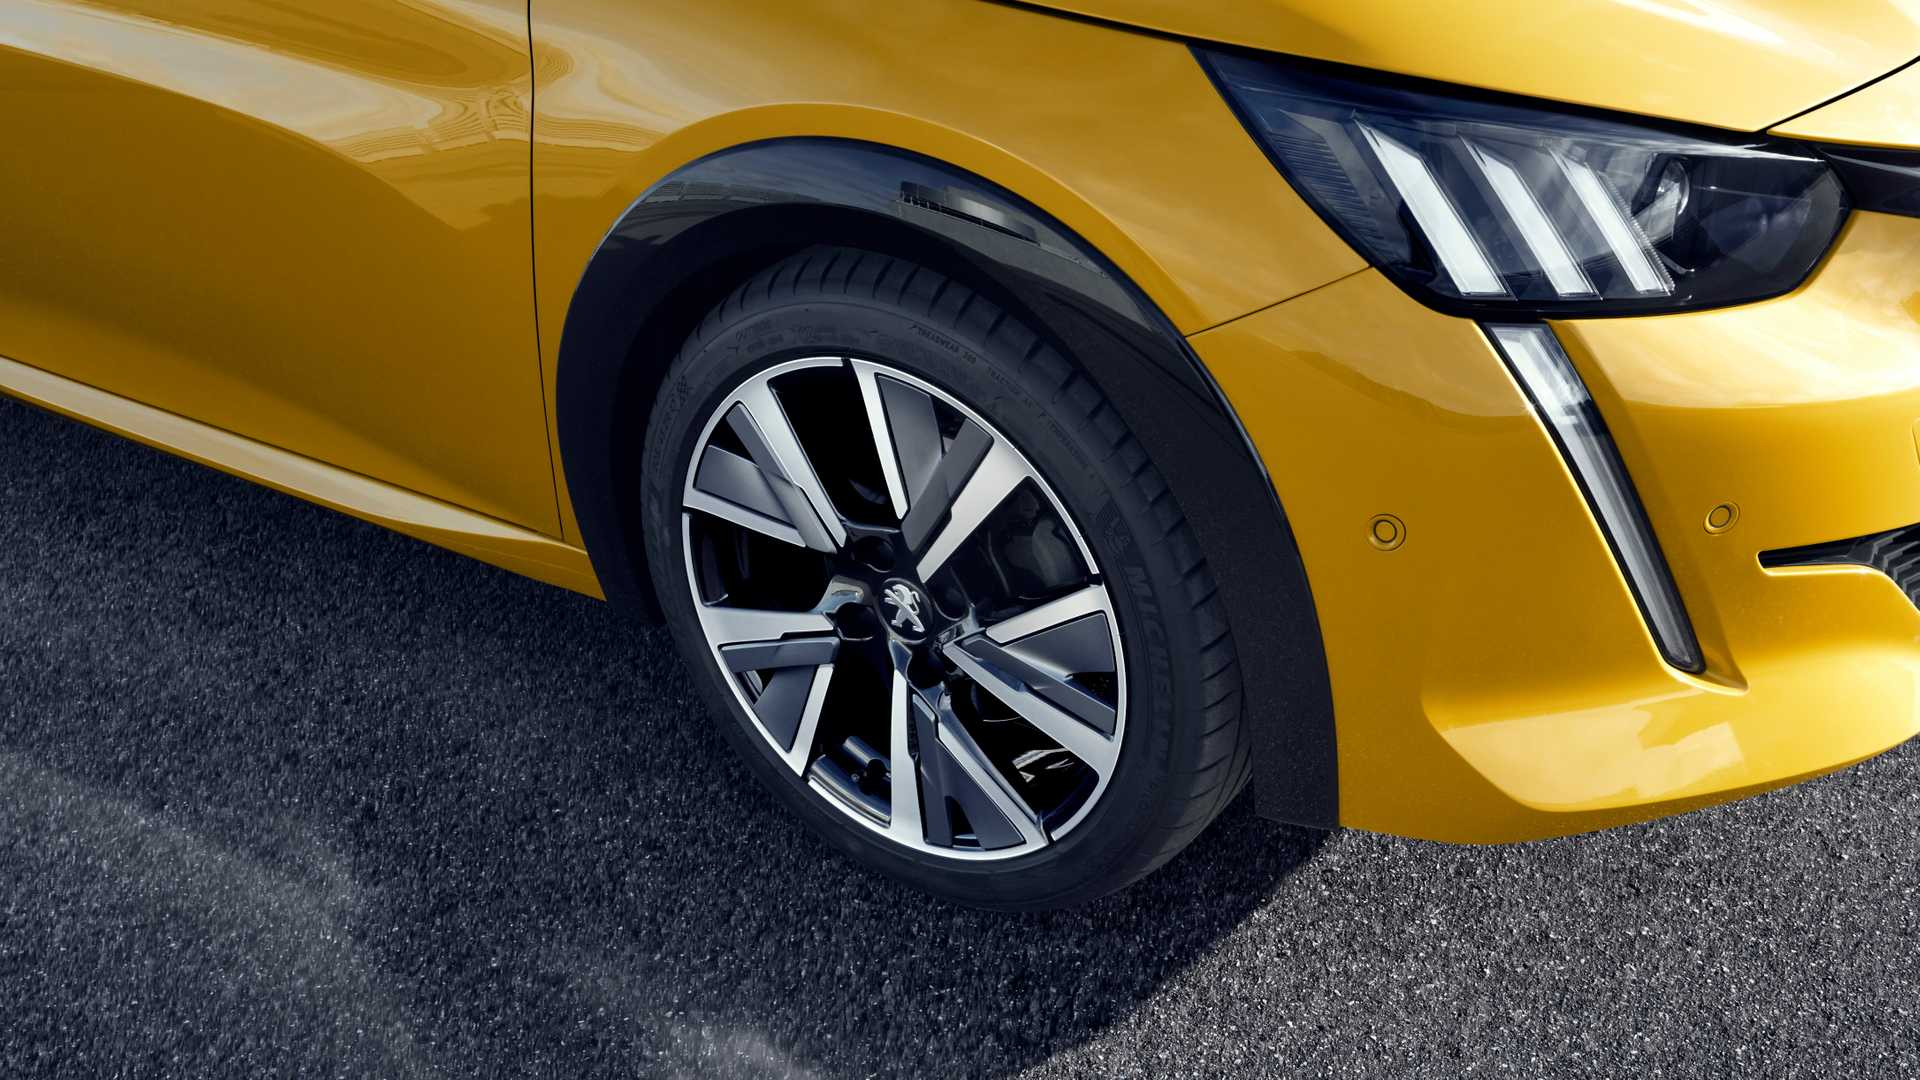 2020 Peugeot 208 Wheel Wallpapers (15)